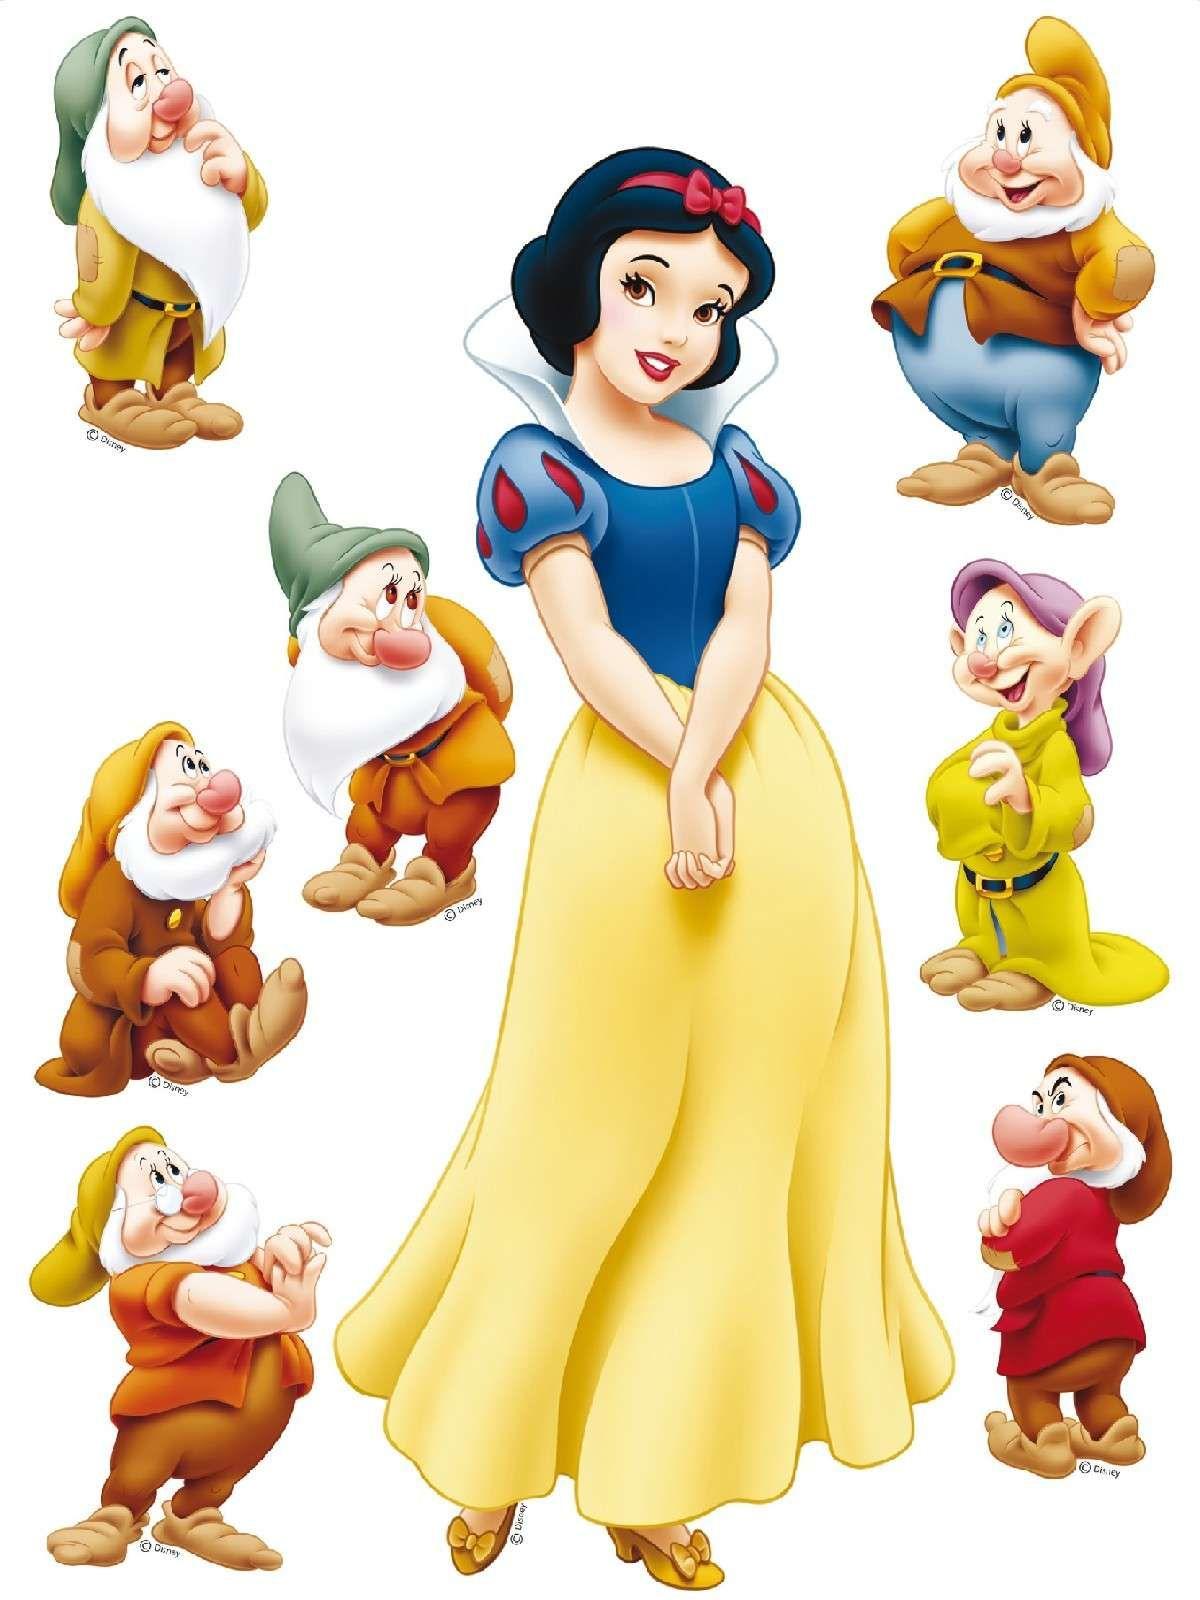 Disney princesses disney snow white wallpaper free download disney poster sticker wall tattoo snow white and the seven dwarfs amipublicfo Choice Image